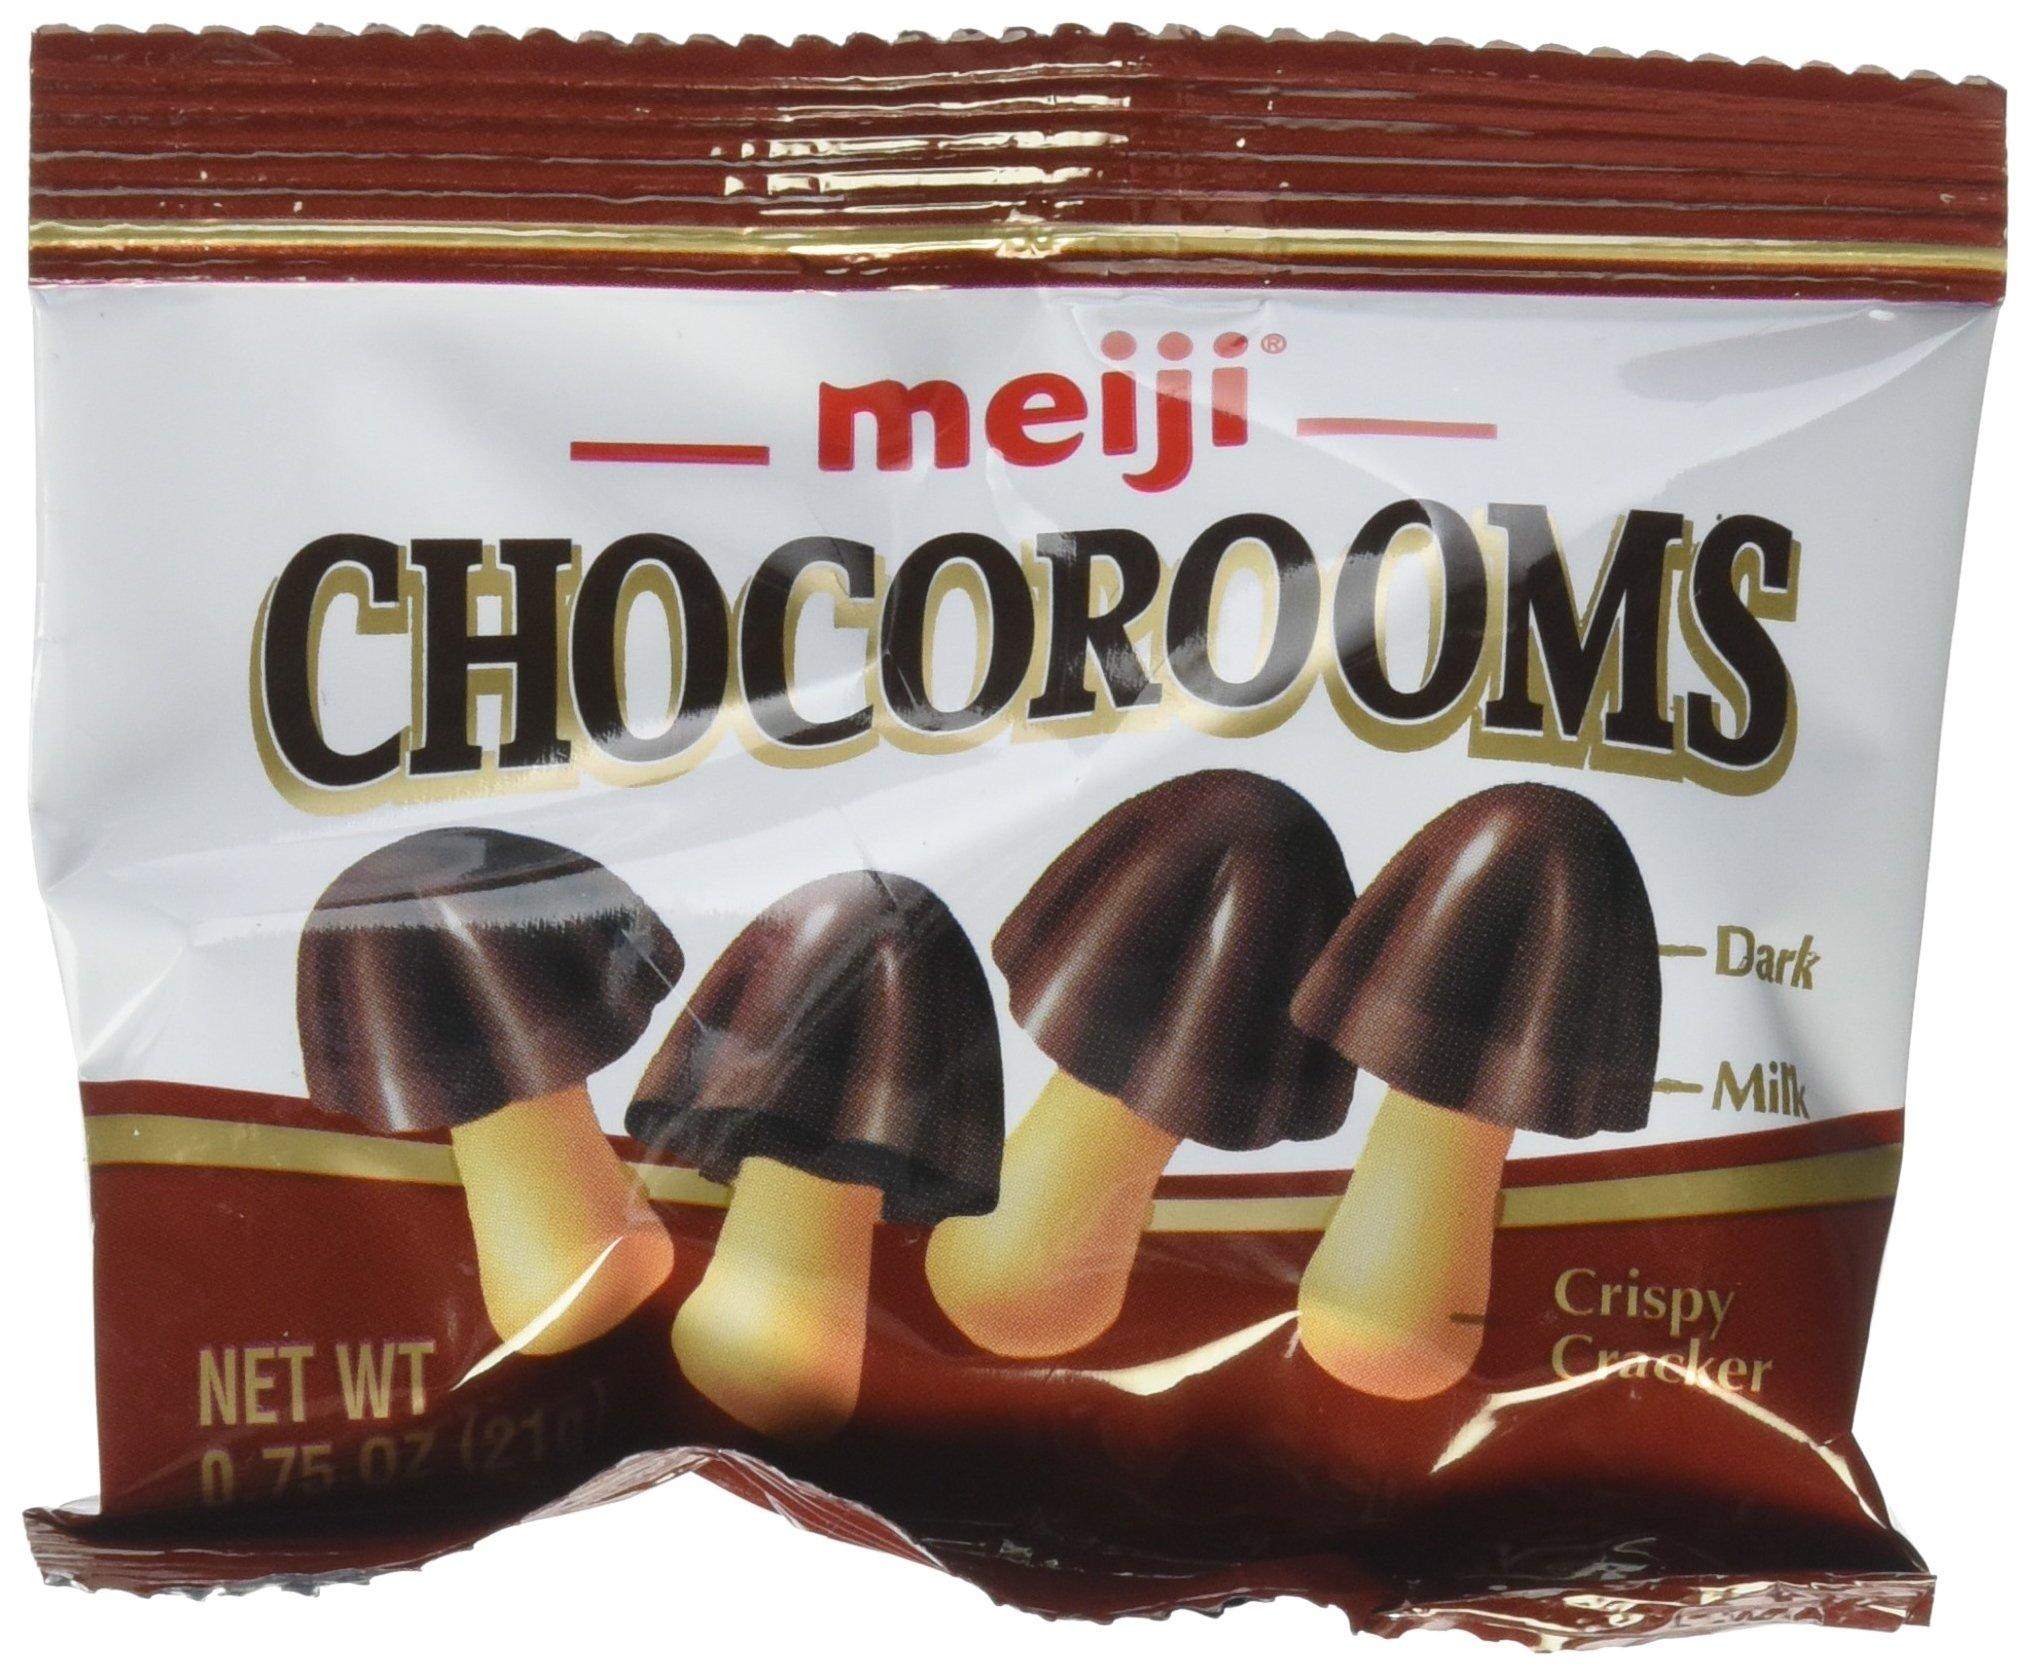 Meiji Chocorooms 24 individual 21g bags by Meiji